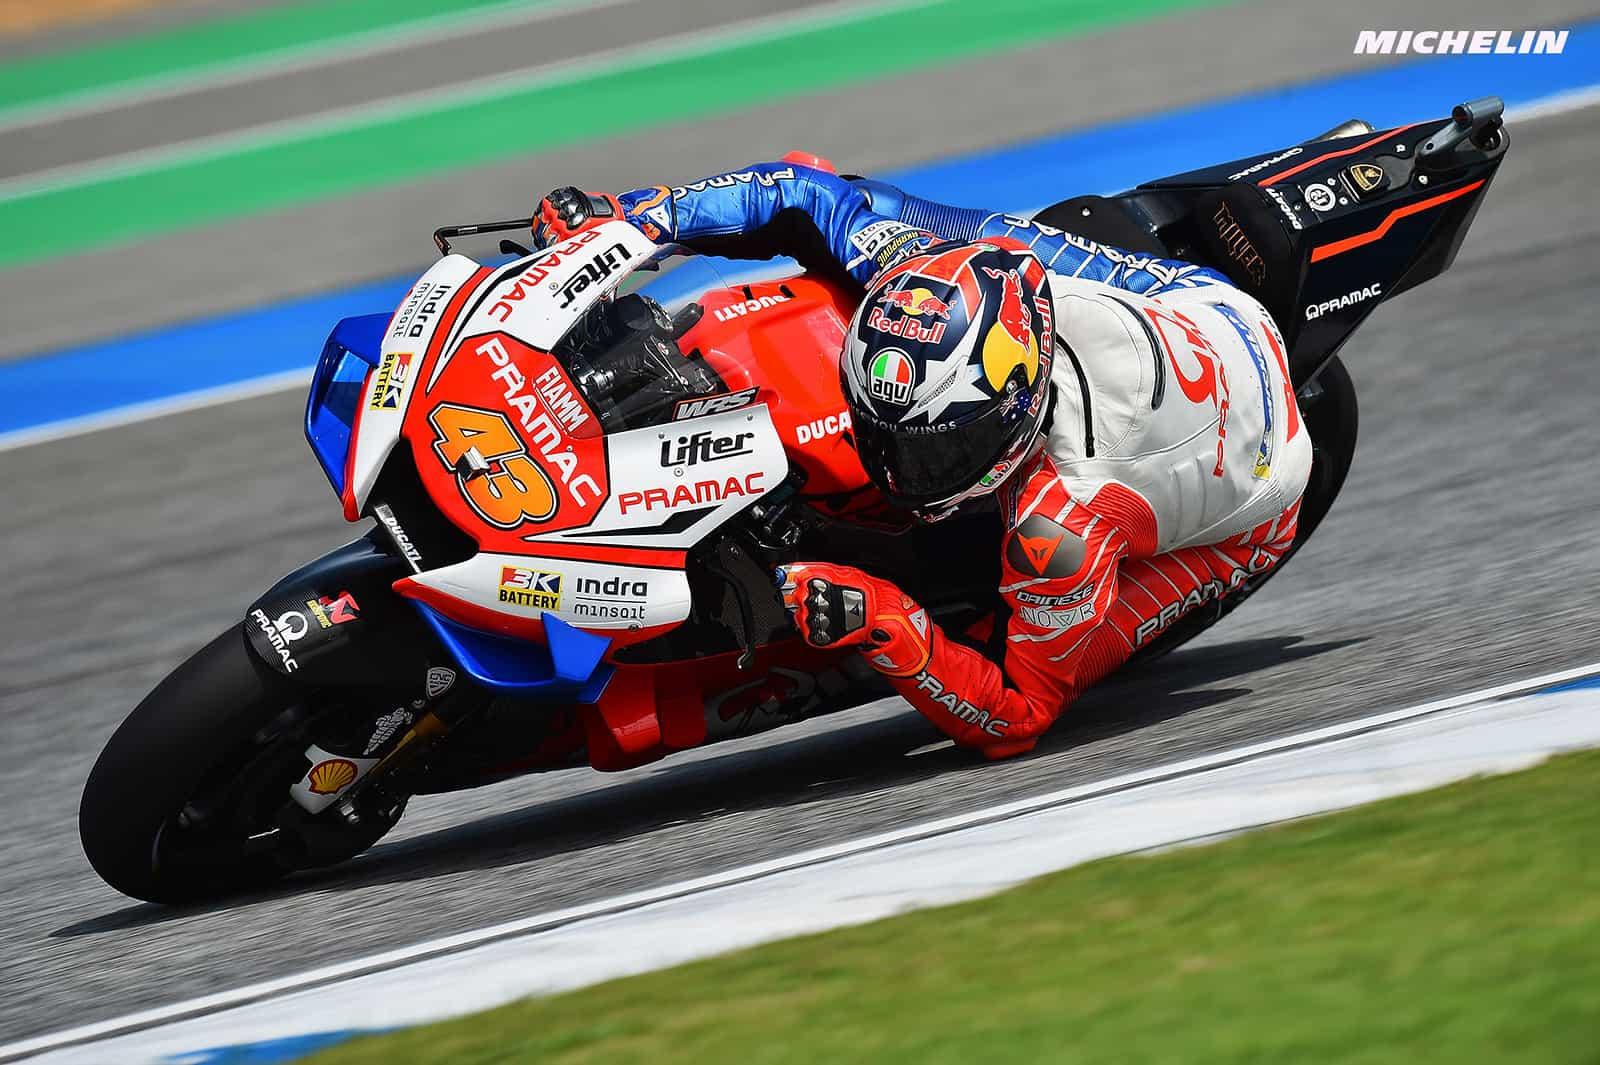 MotoGP2019タイGP 予選6位ミラー「FP4の内容からもレースに自信がある」